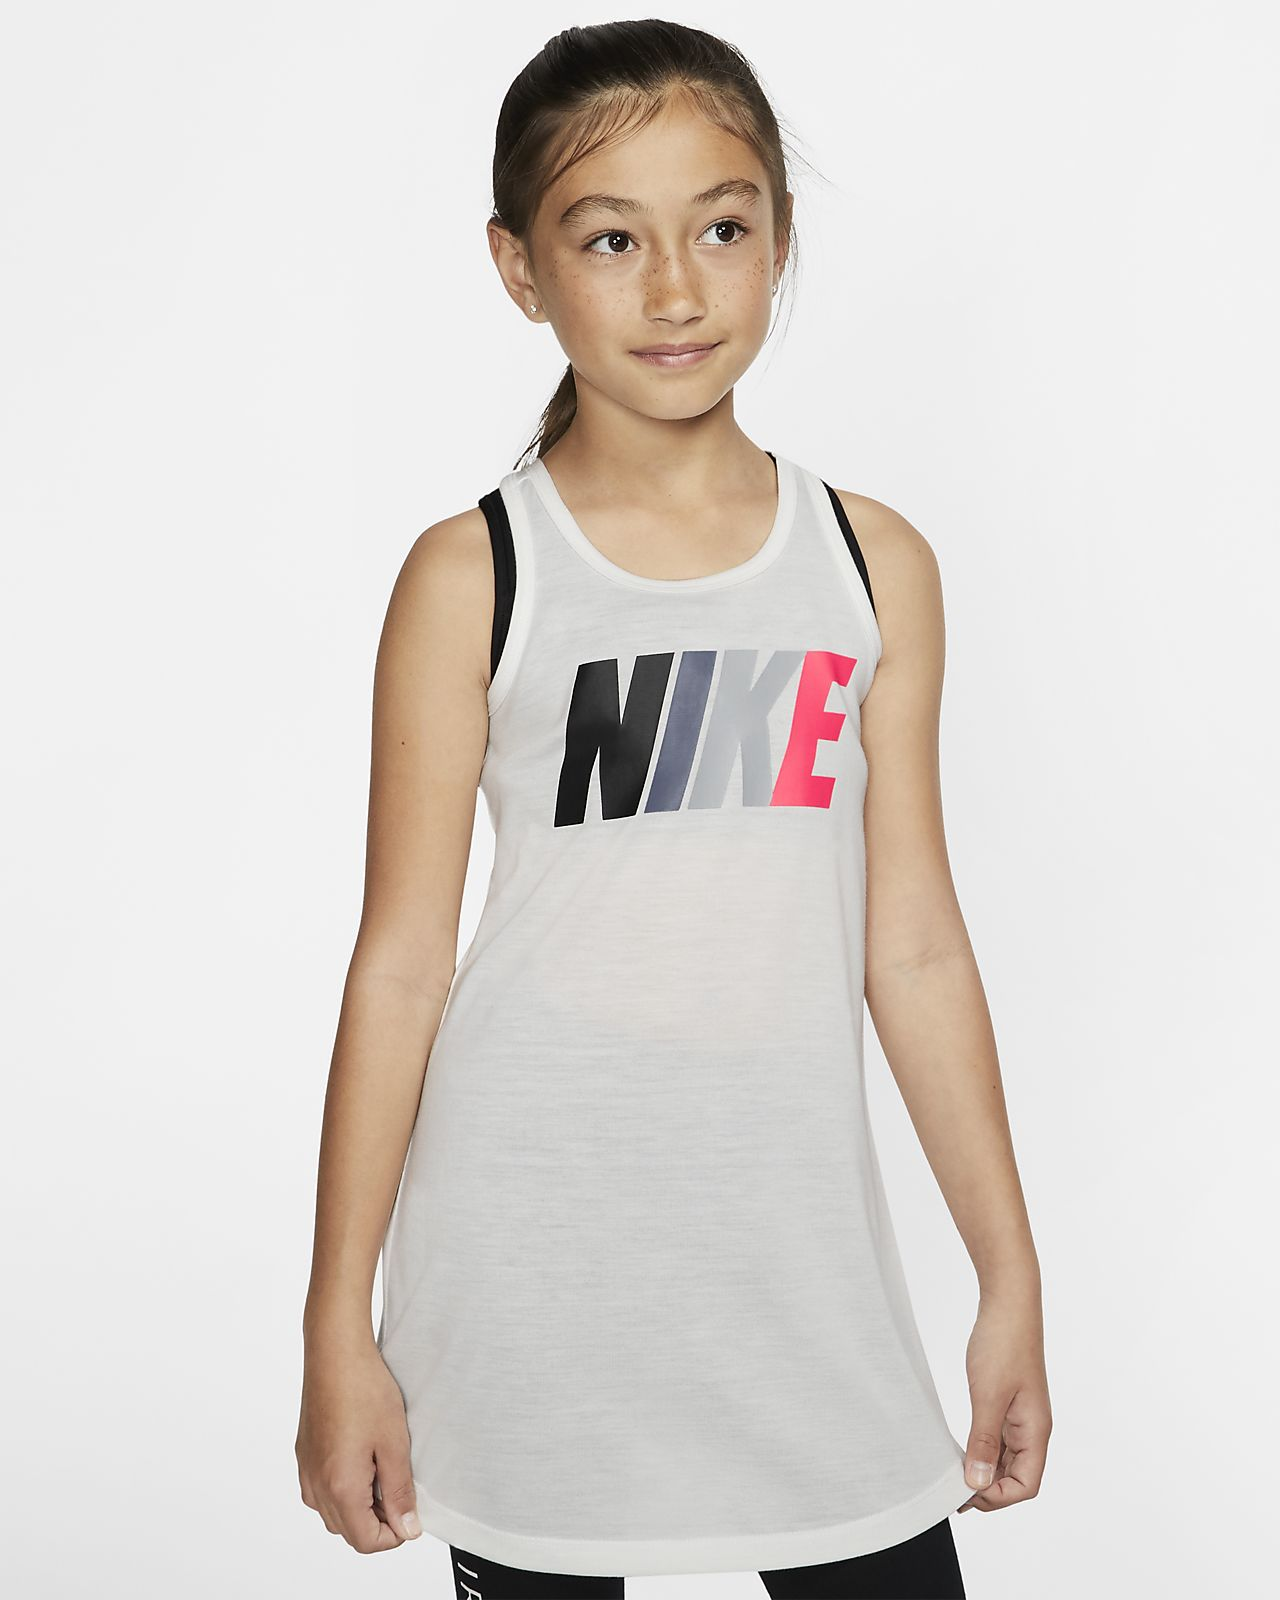 Nike JDI Vestido - Niño/a pequeño/a